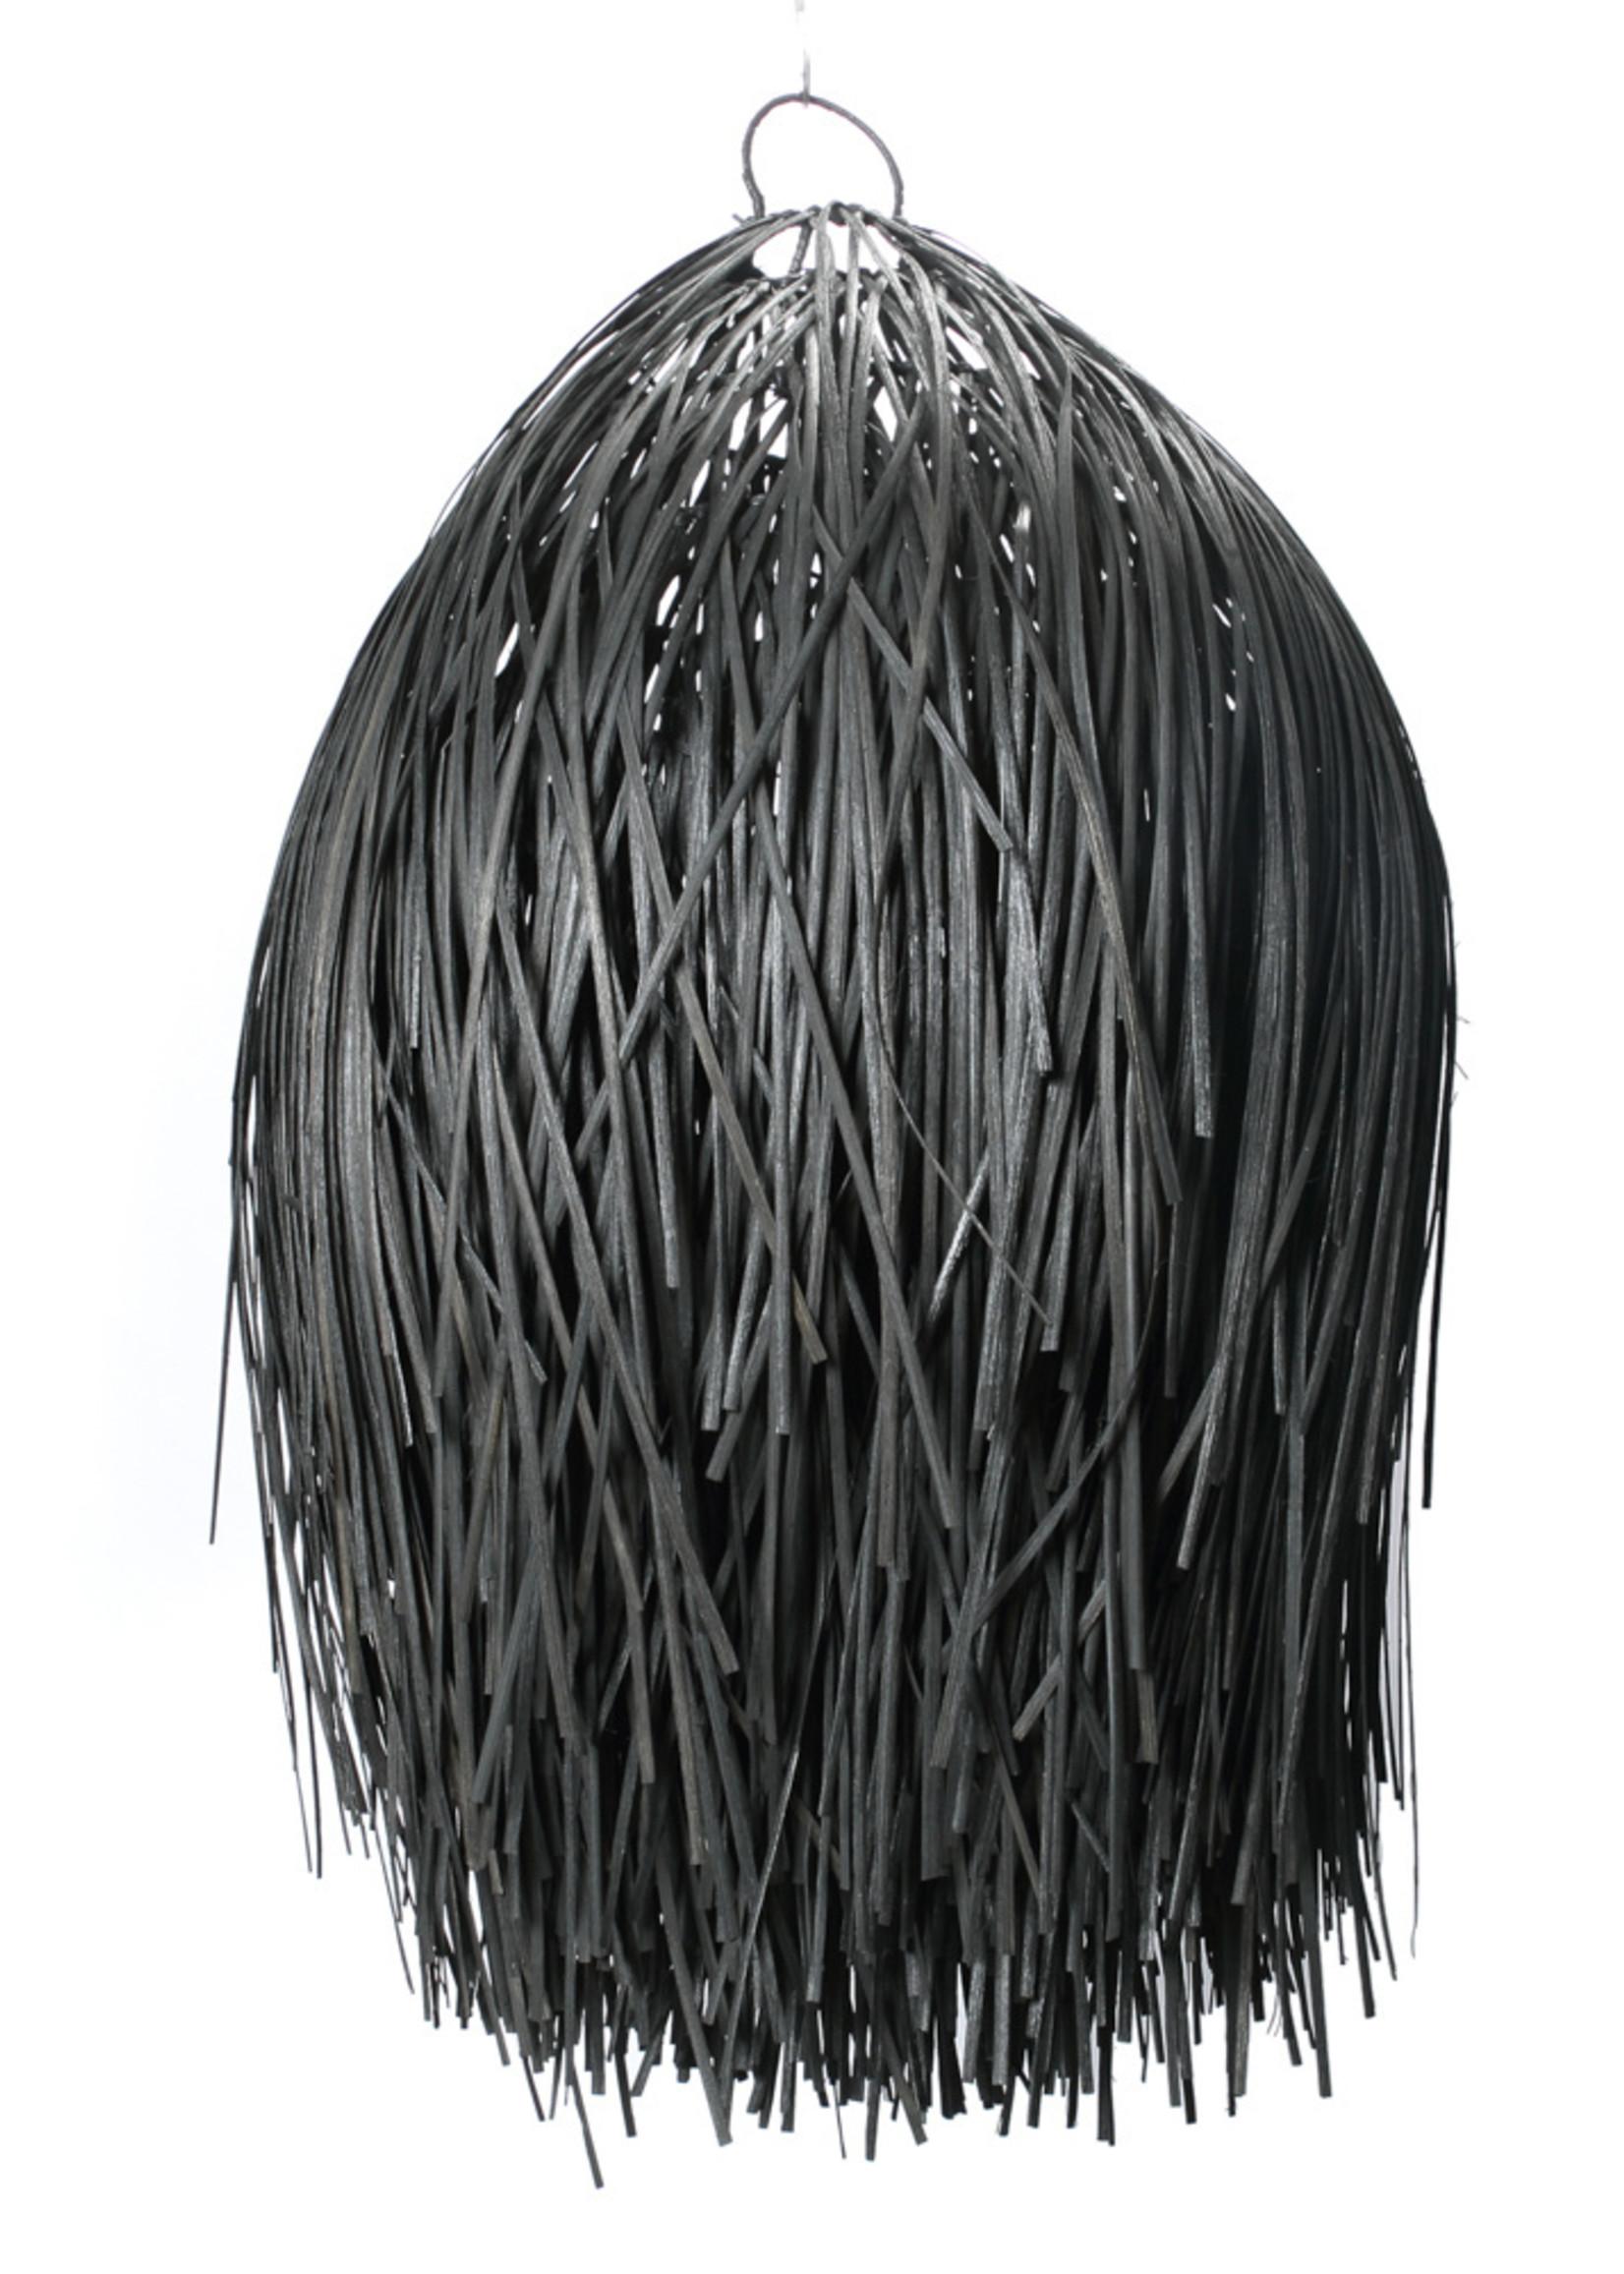 The Rattan Shaggy Pendant - Black - L